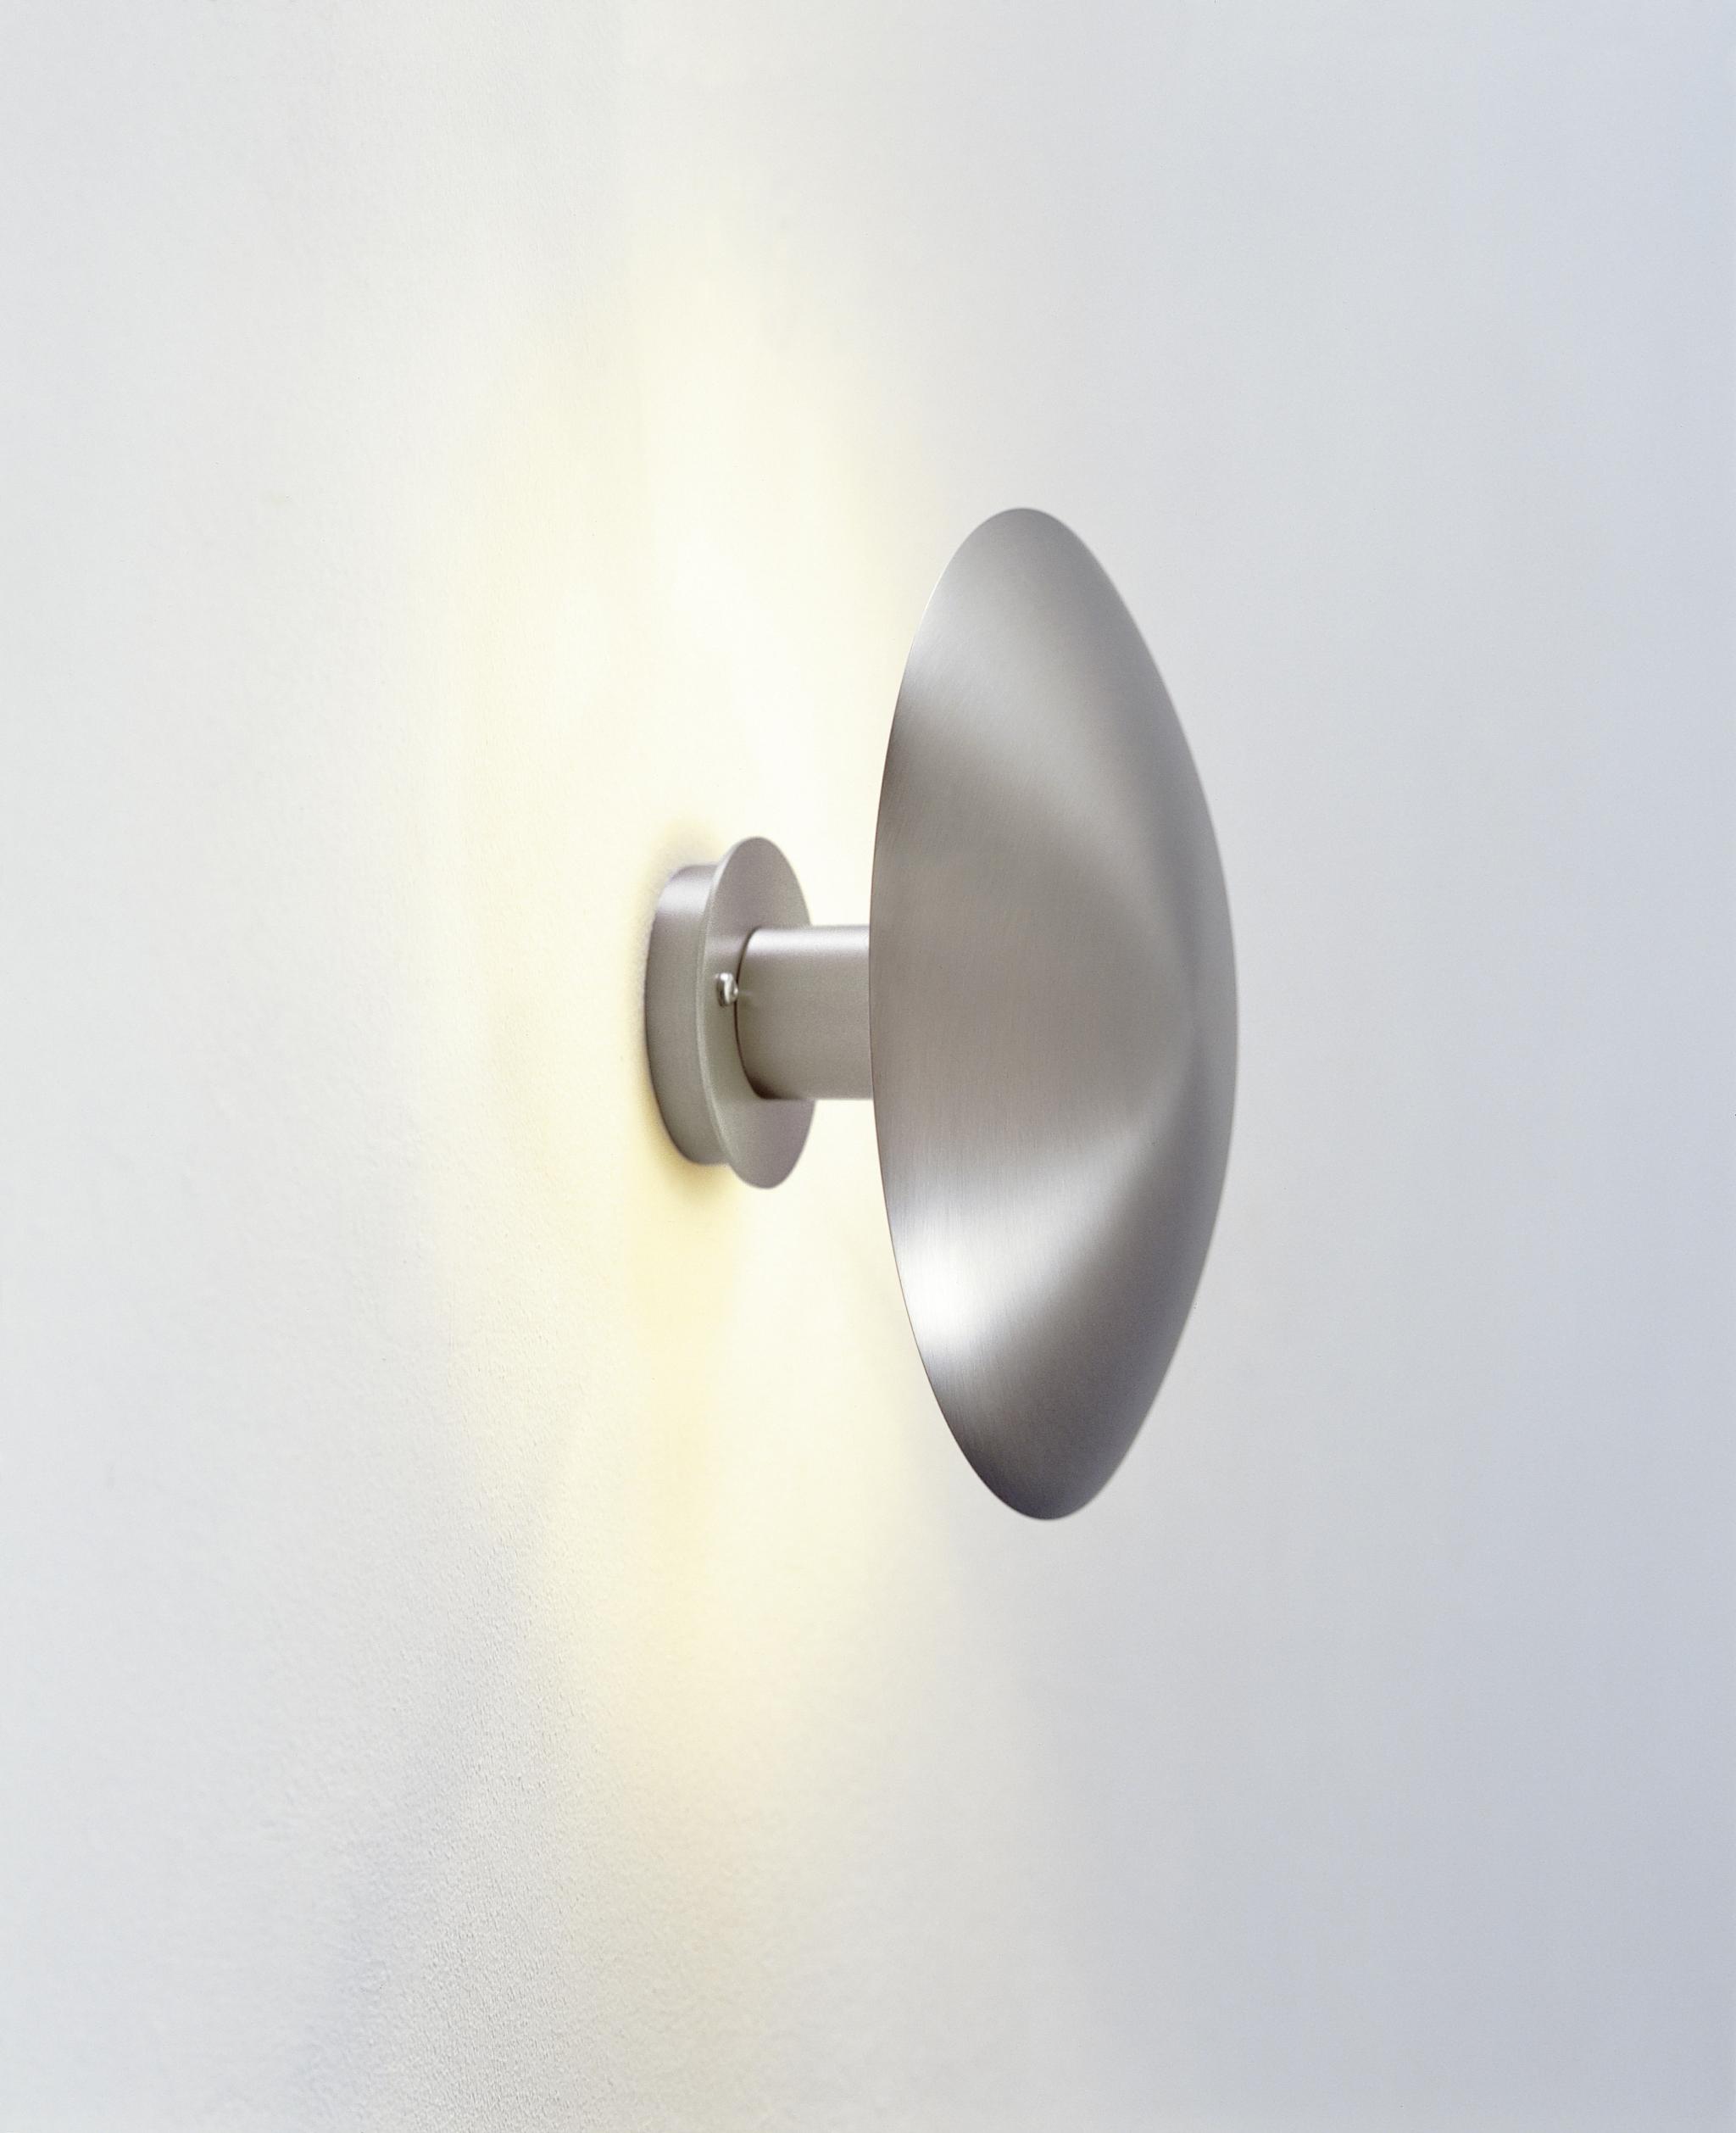 Disco Wall Lamps Jordi Miralbell Mariona Ravents 200w Lamp Flasher